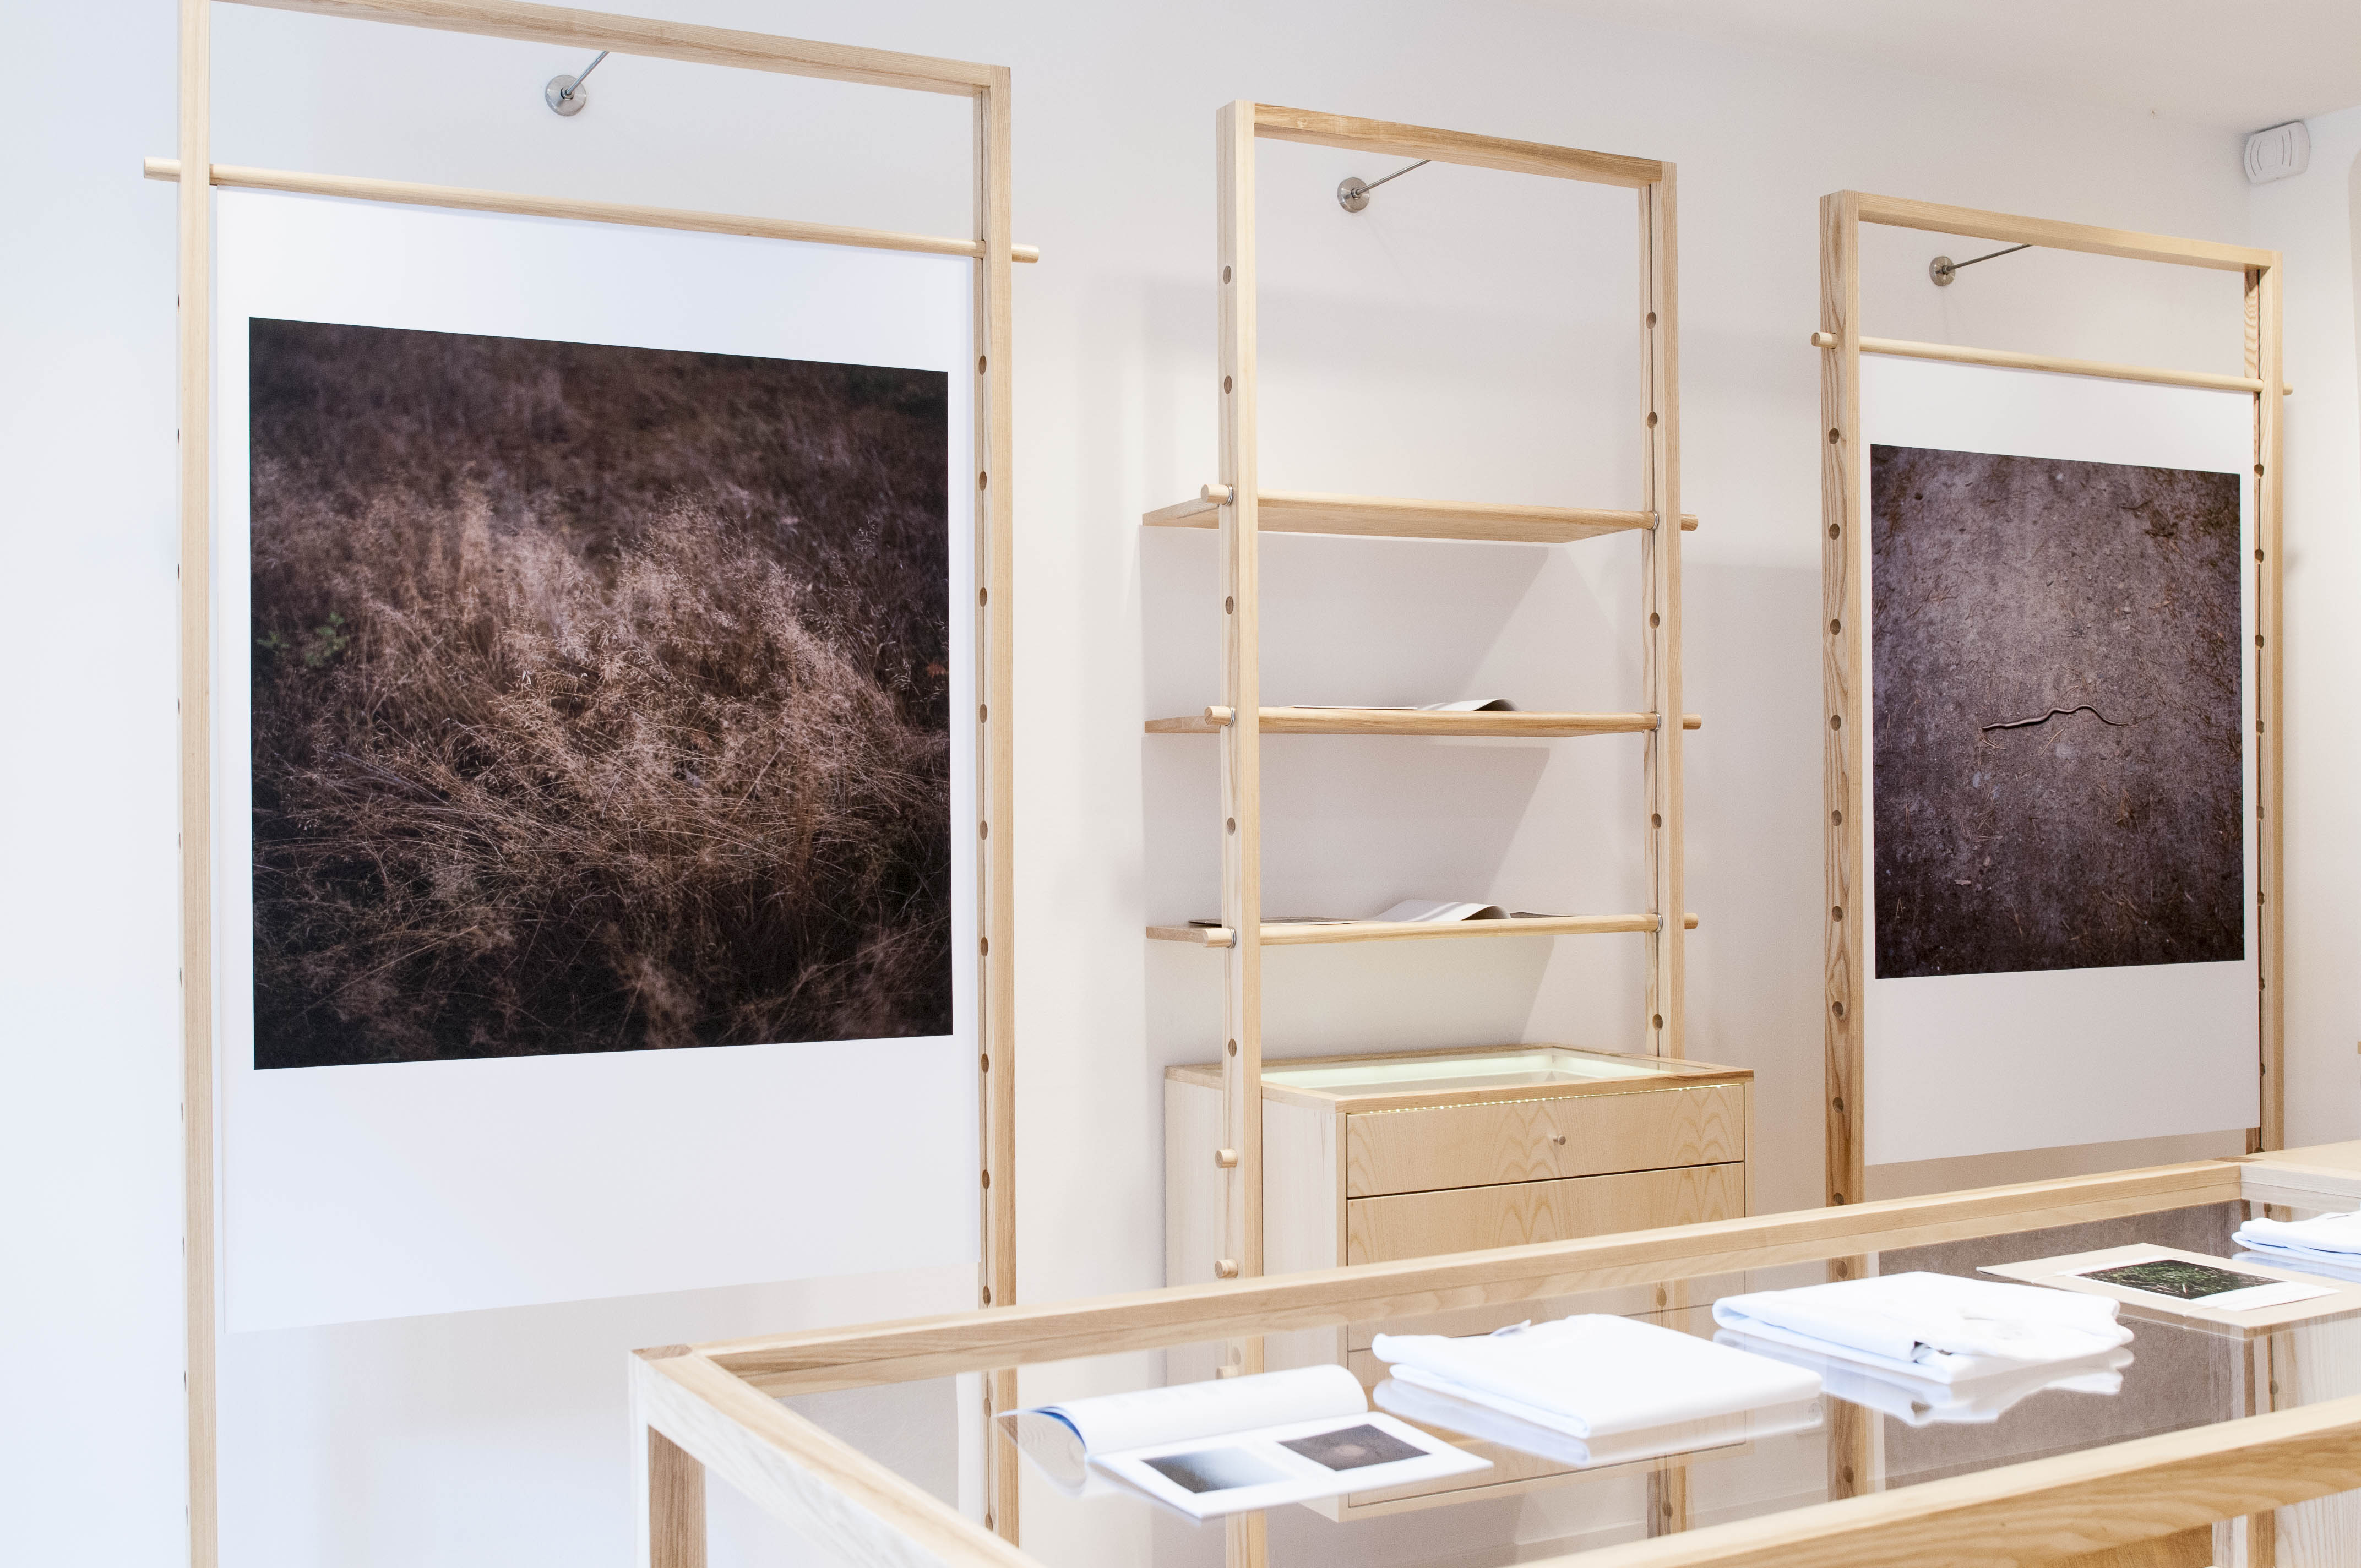 The Anne Schwalb exhibit at Sunspel's new Berlin store